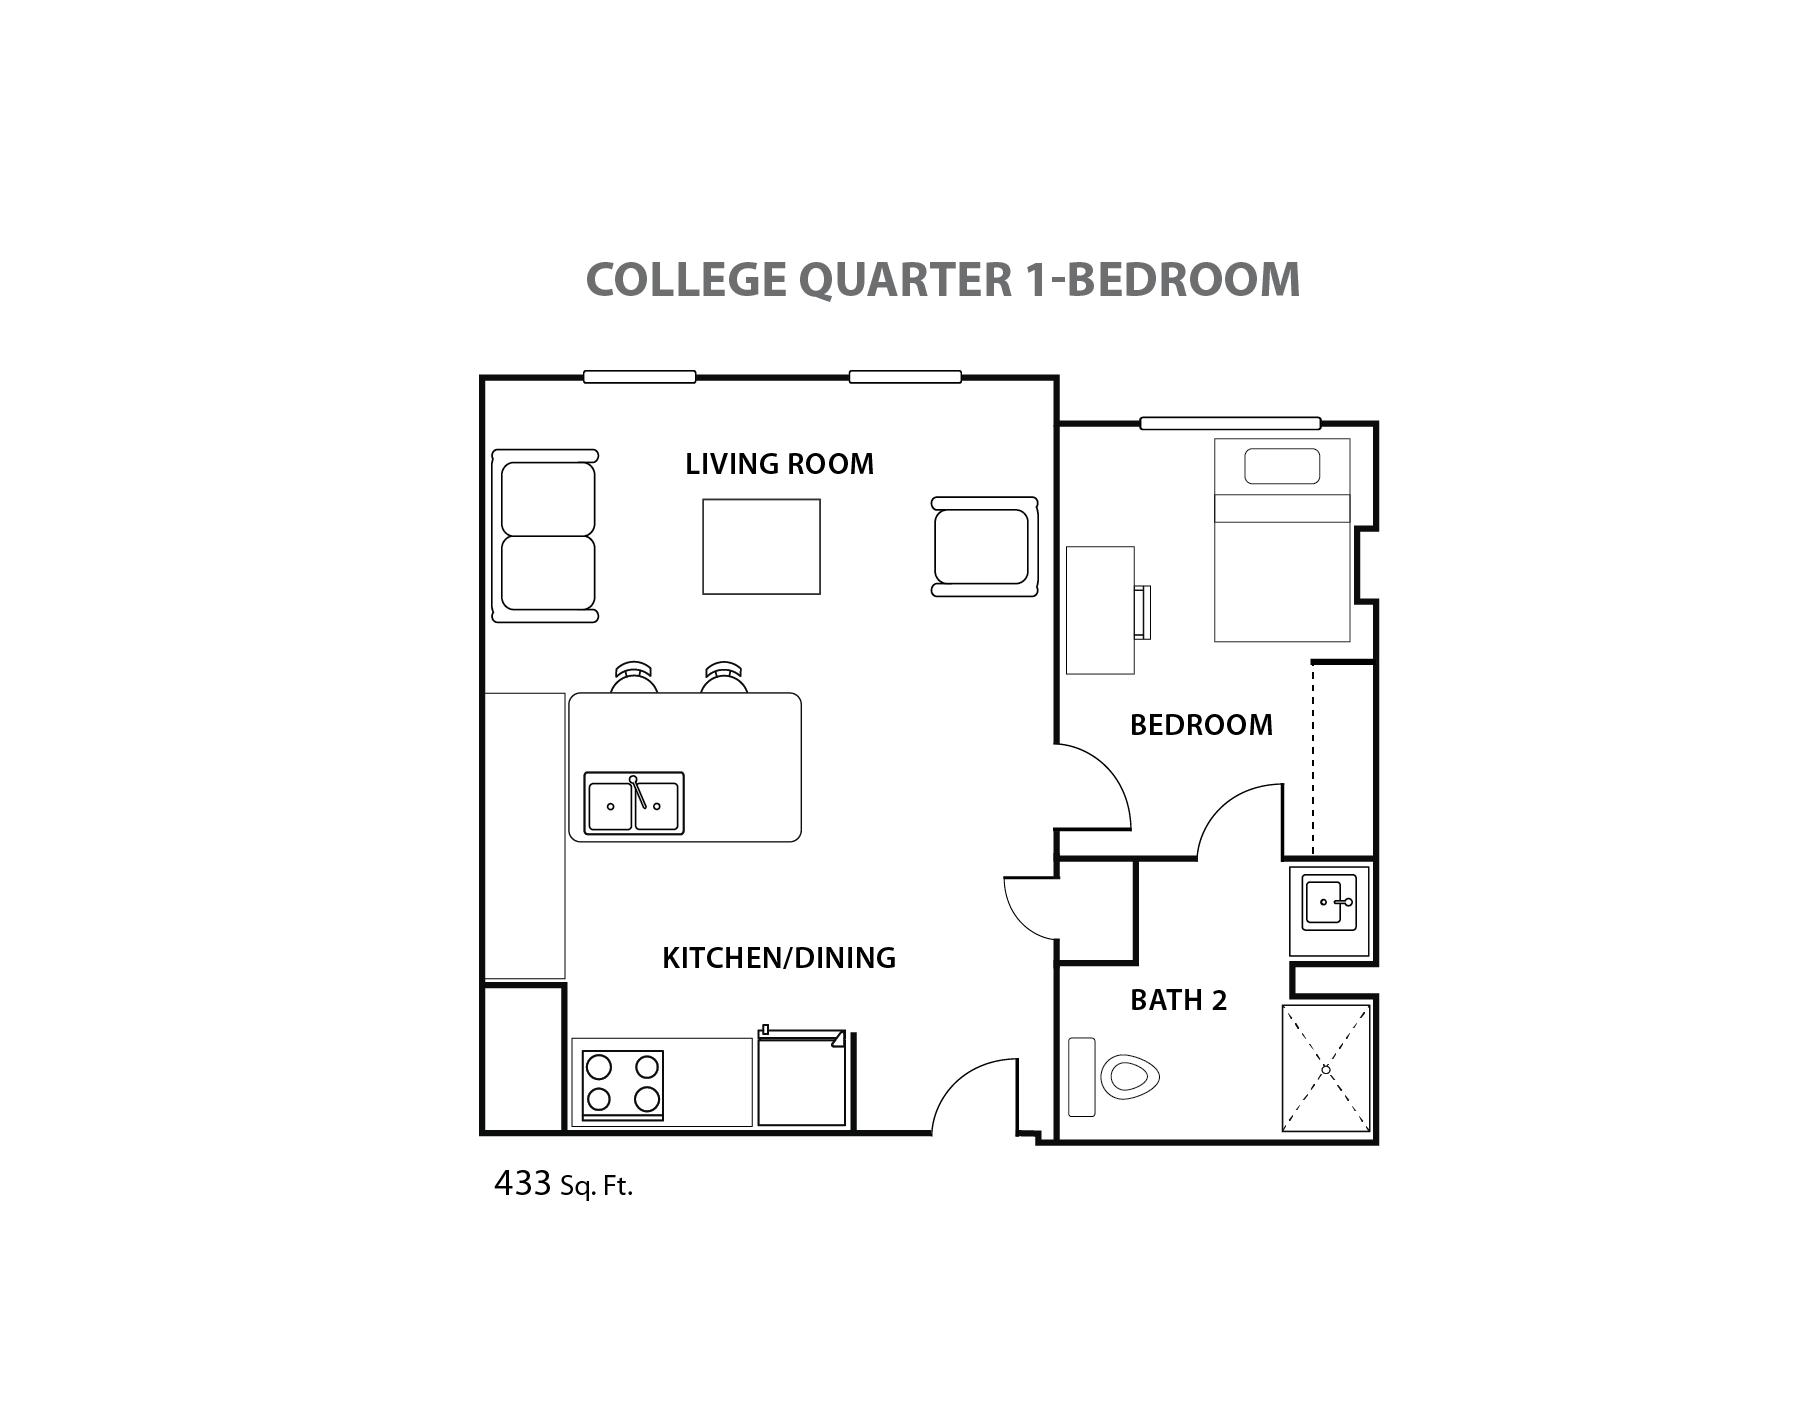 Cq Floor Plans Residence University Of Saskatchewan